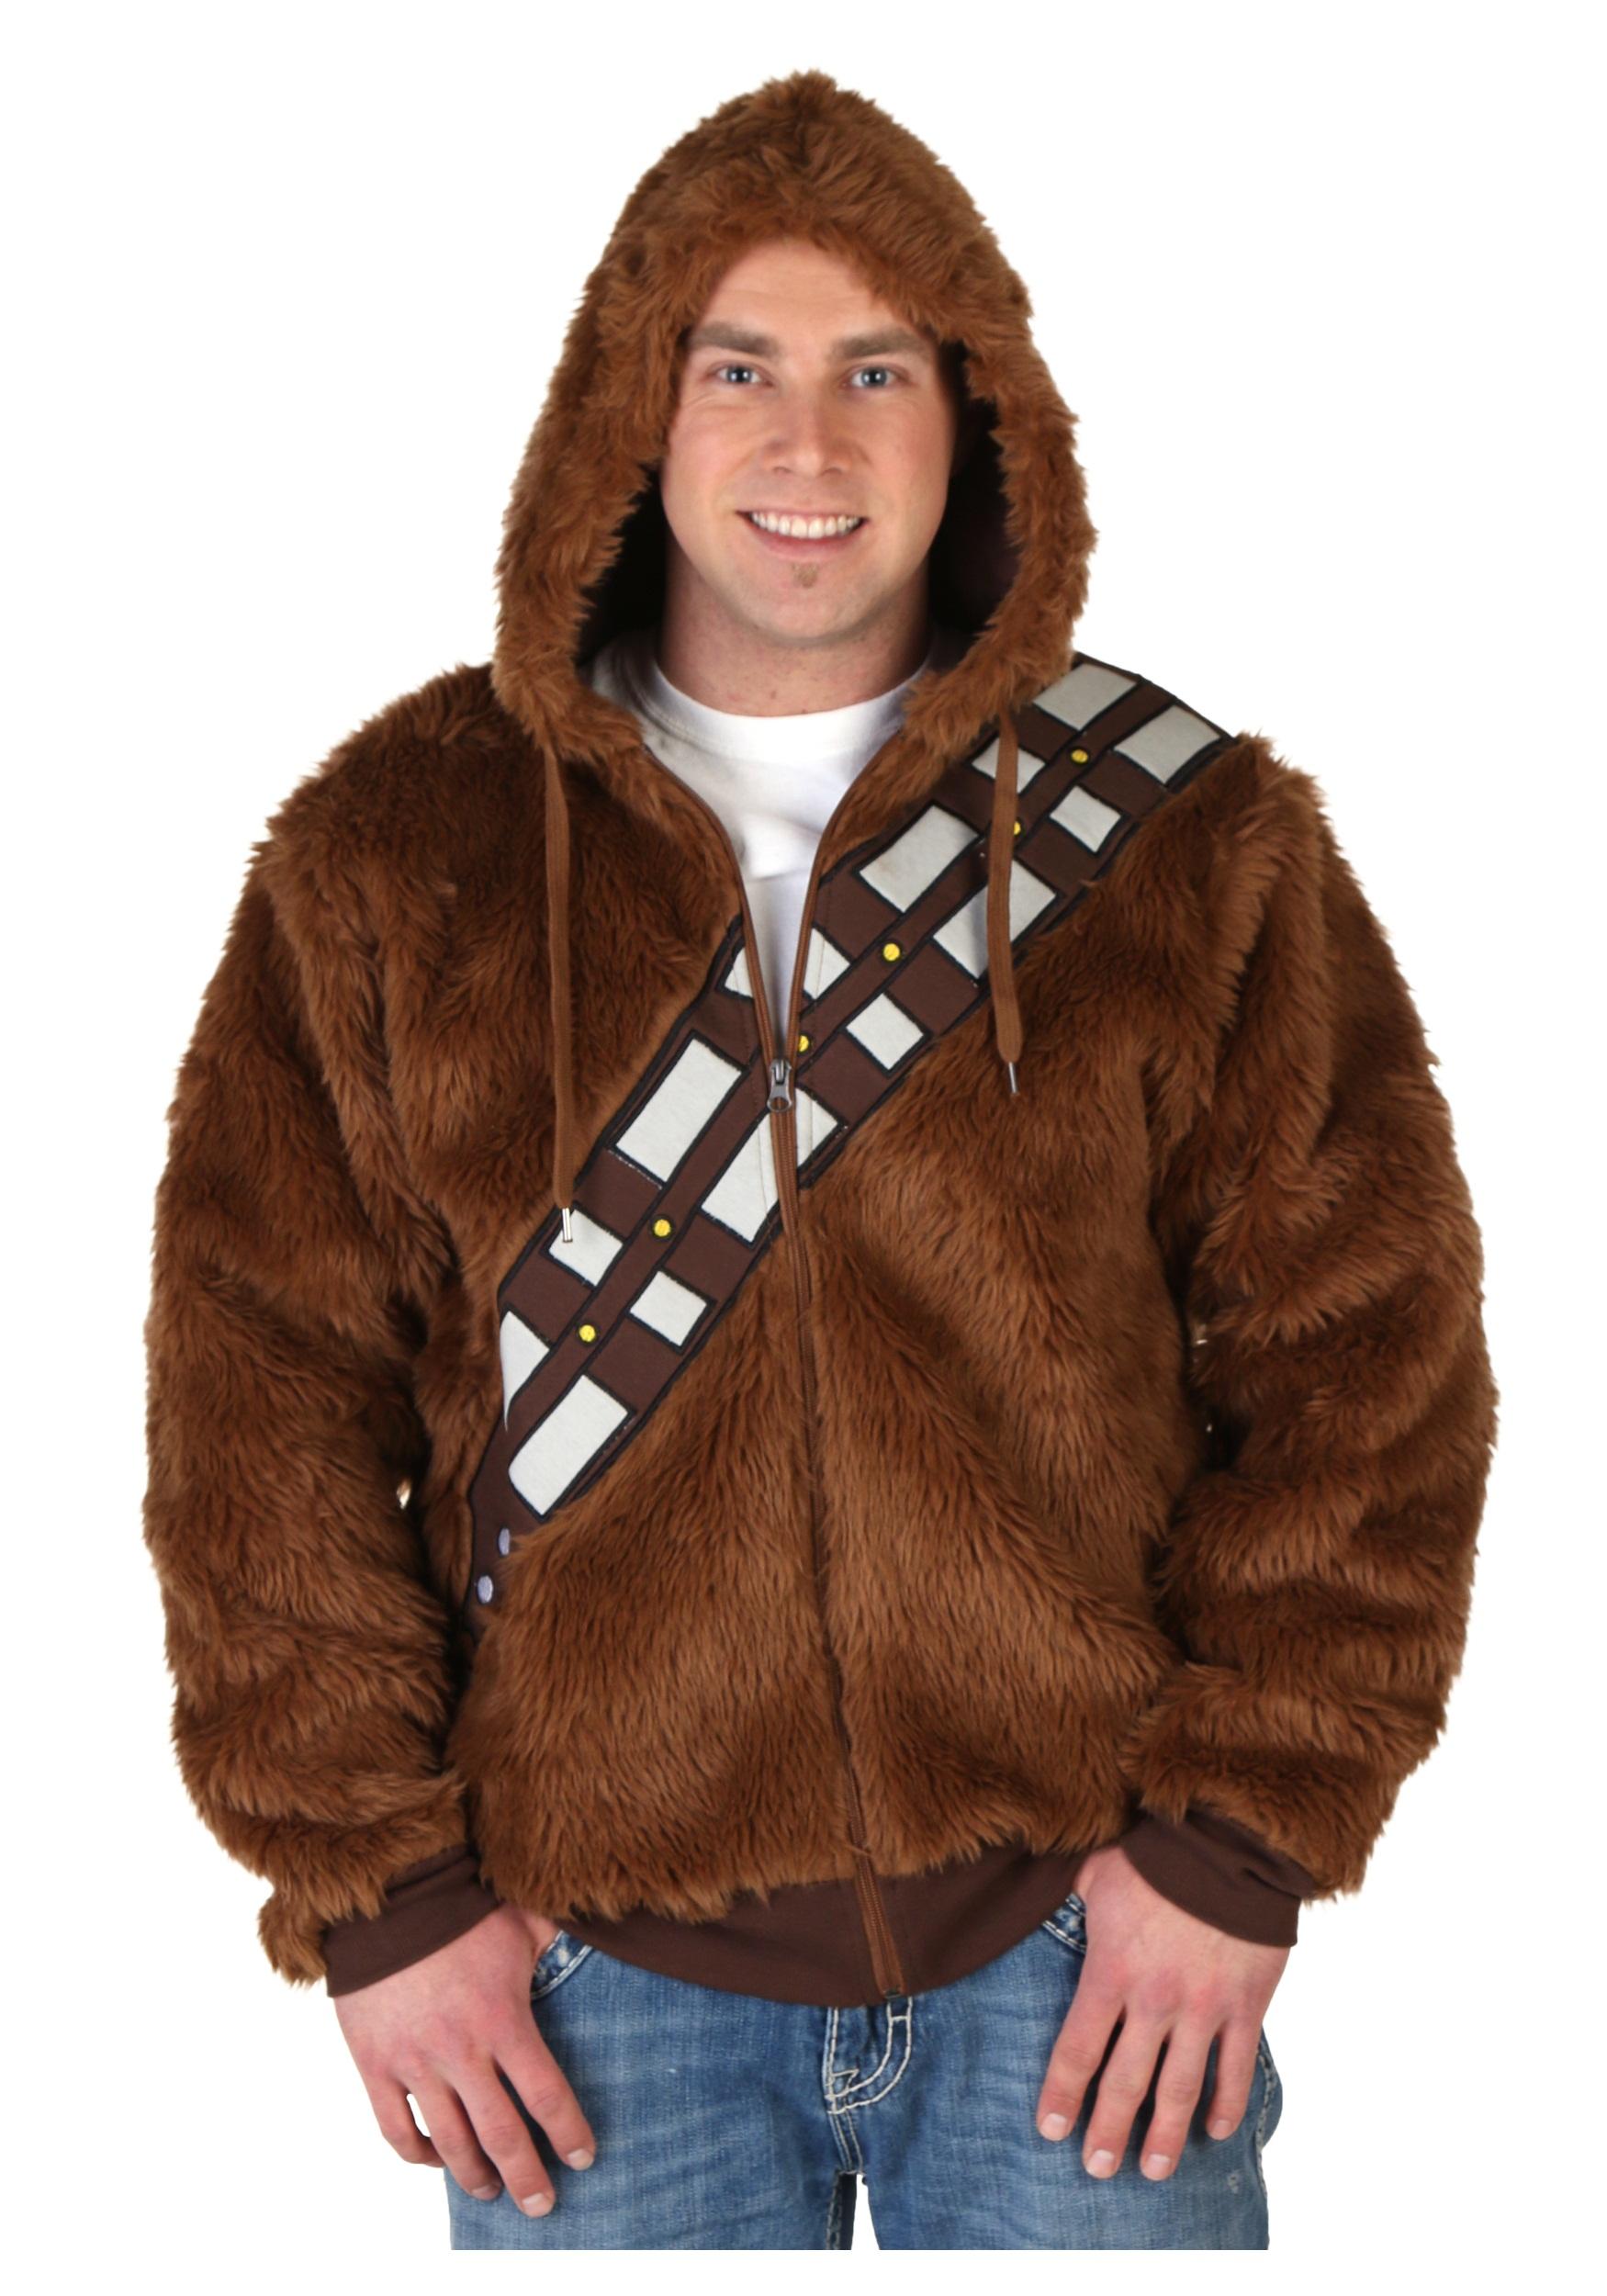 Chewbacca Costume Hoodie Chewbacca Costume Hoodie 2 ...  sc 1 st  Halloween Costumes & Chewbacca Costume Hoodie